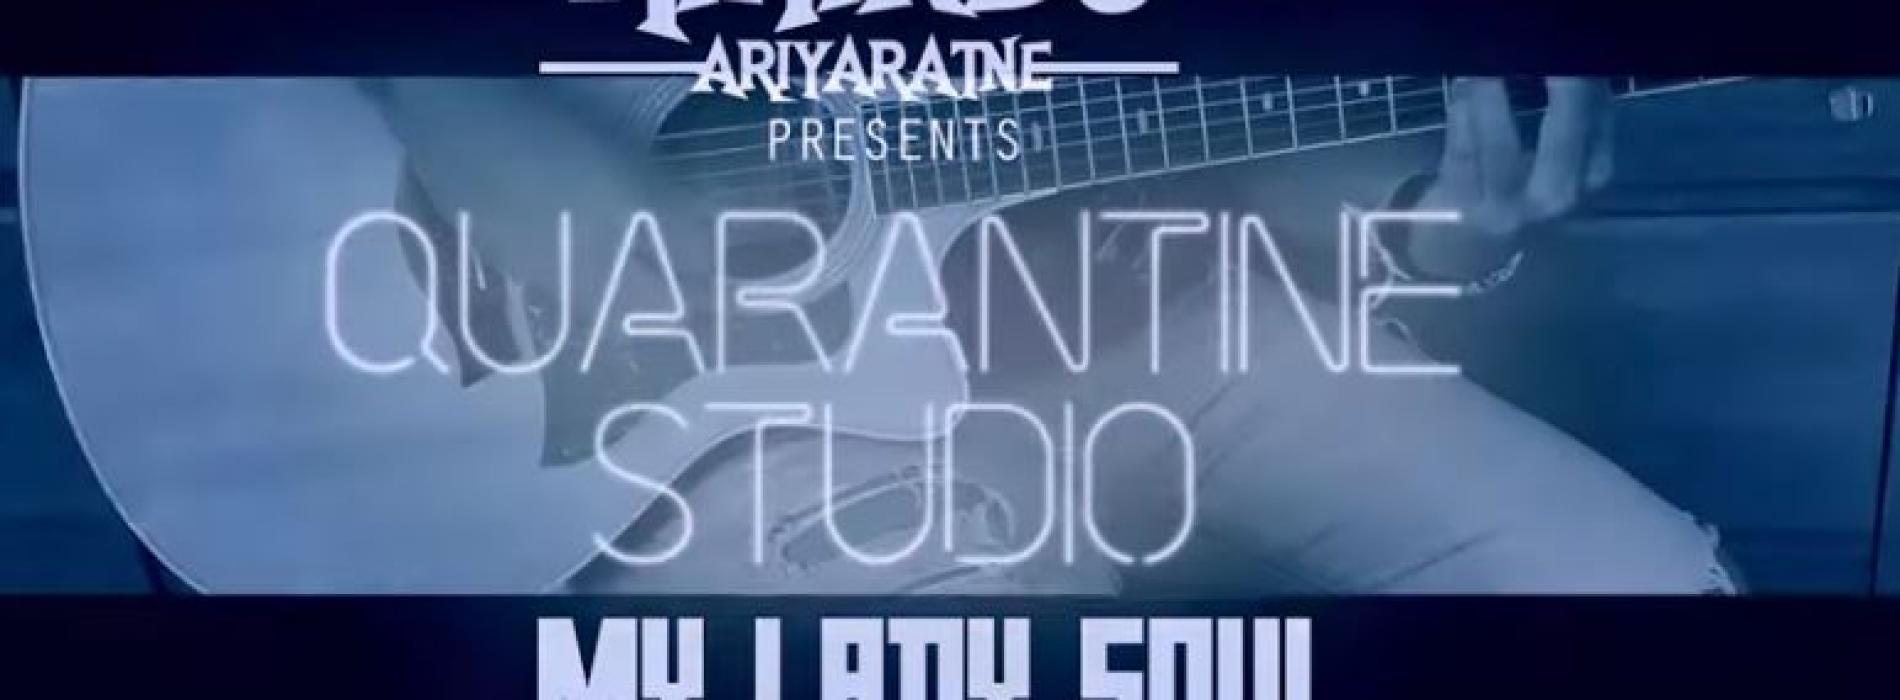 My Lady Soul [Acoustic Cover]   Mihindu Ariyaratne   Quarantine Studio Ep2